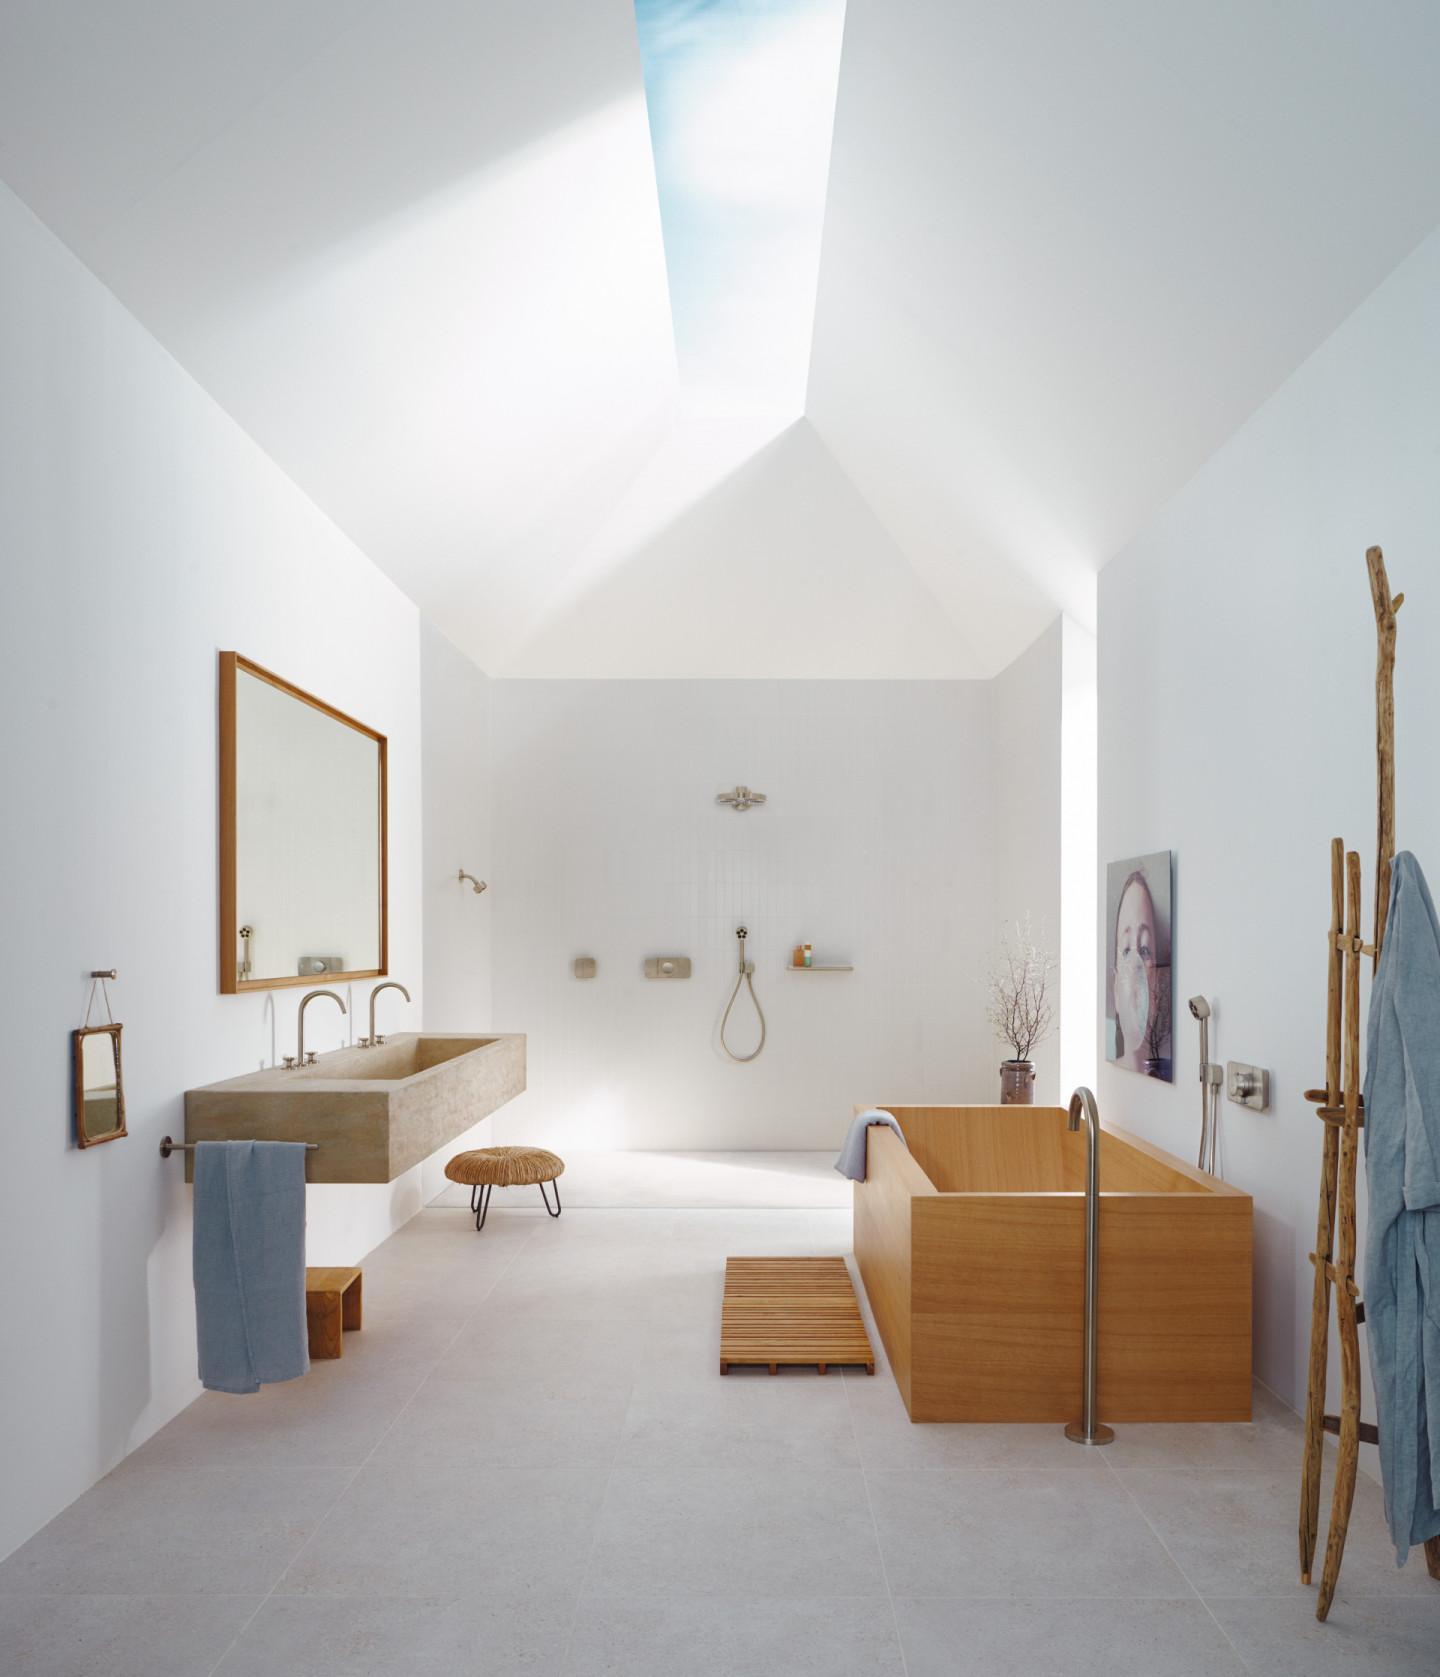 Ванная комната «Копенгаген», проект AXOR Compact Luxury, дизайн Barber Osgerby